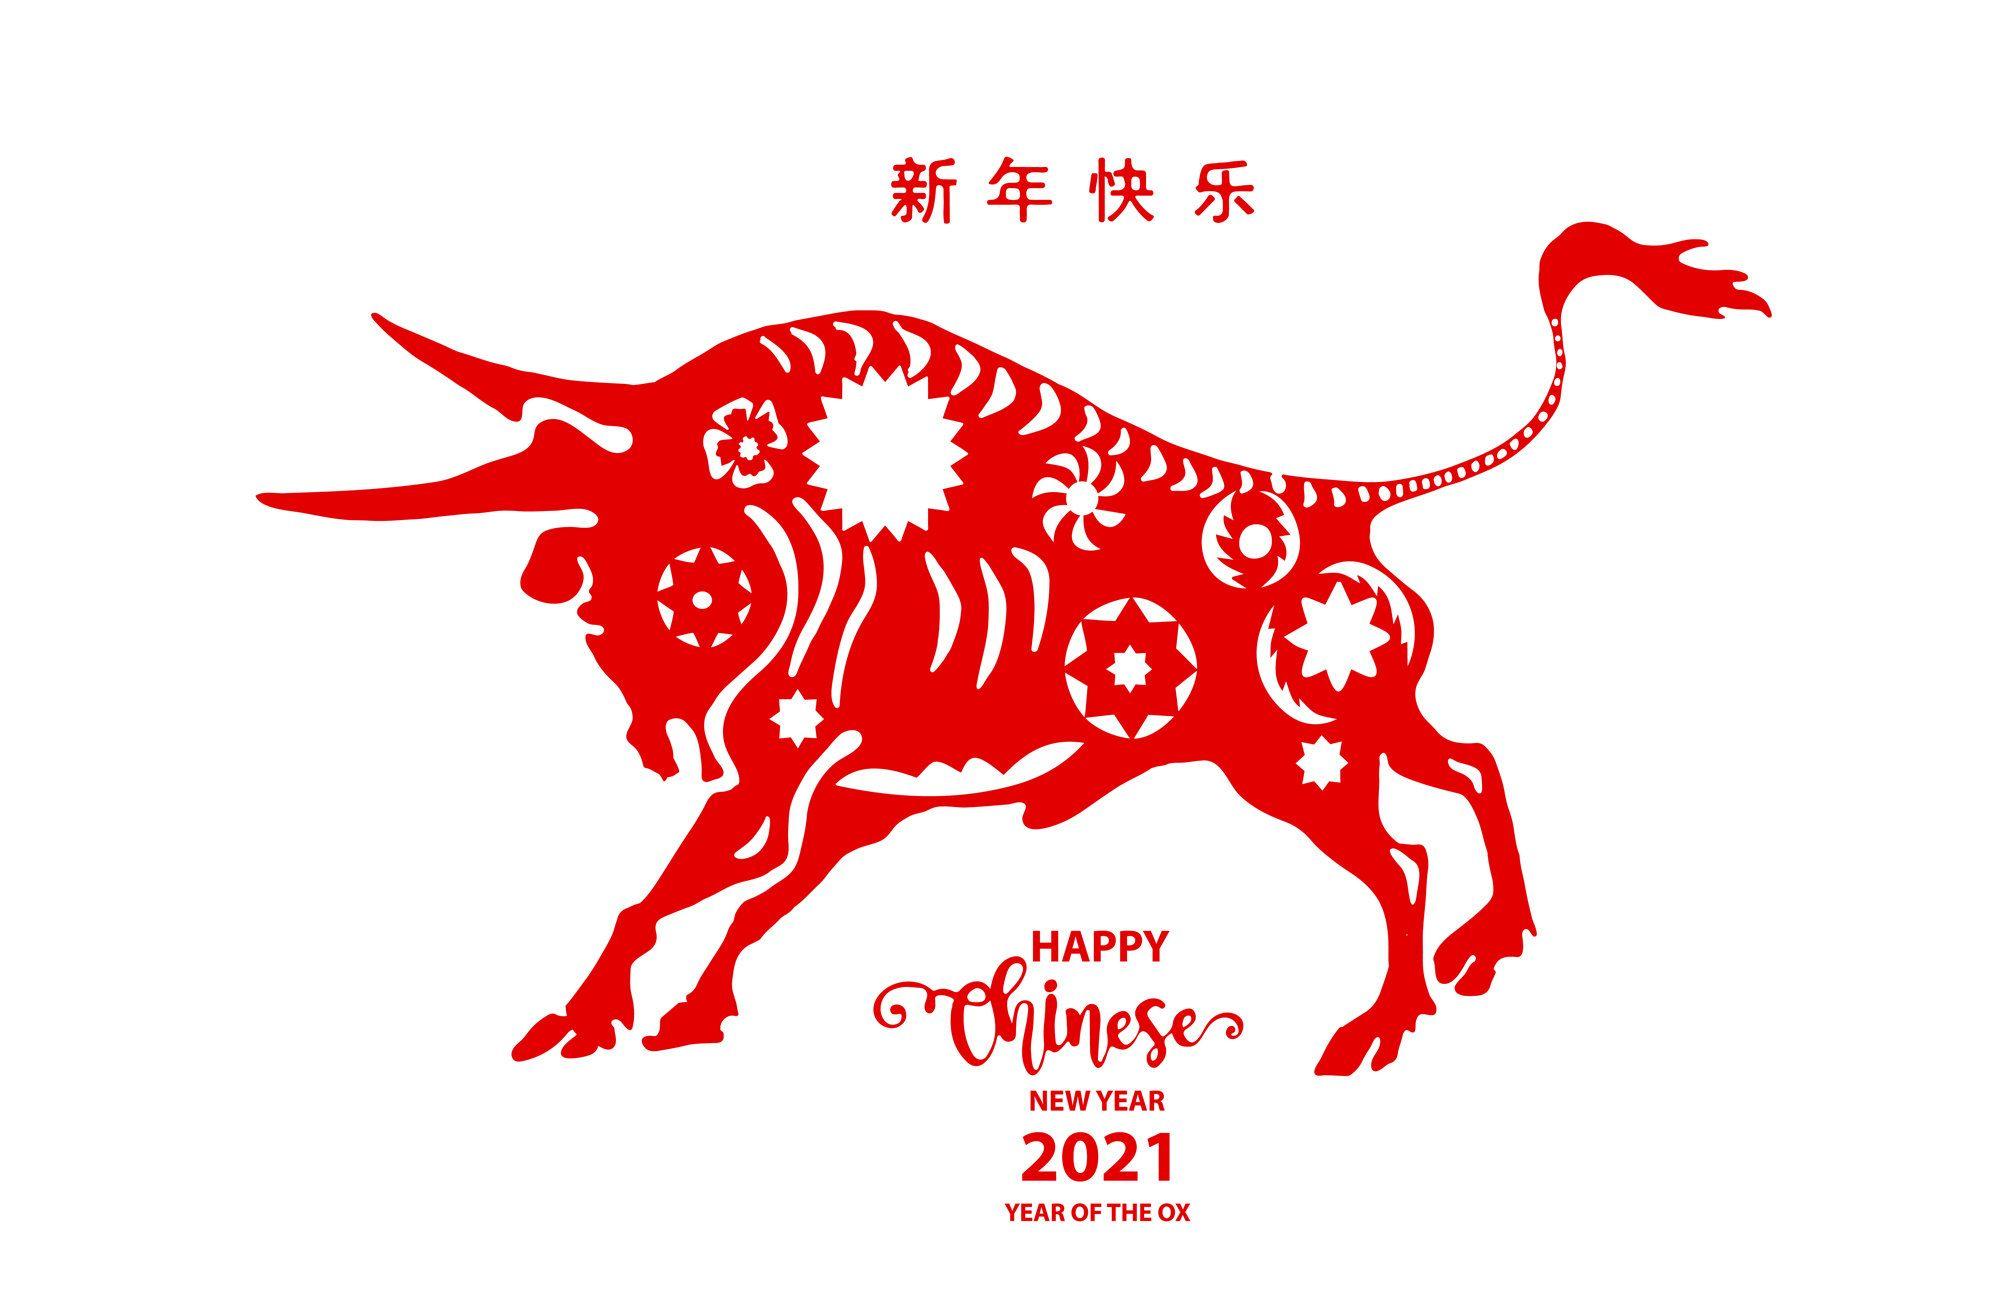 2021 horoscopes all signs